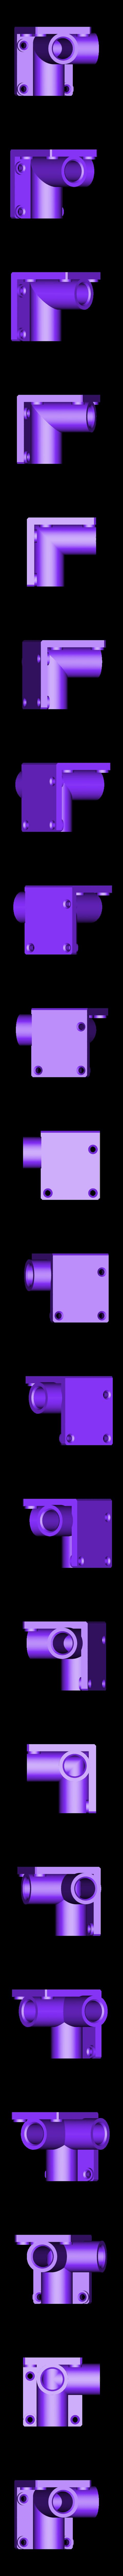 P&B_27.stl Download free STL file P & B ARMY (PIPE AND BOARD) • 3D printable model, DJER